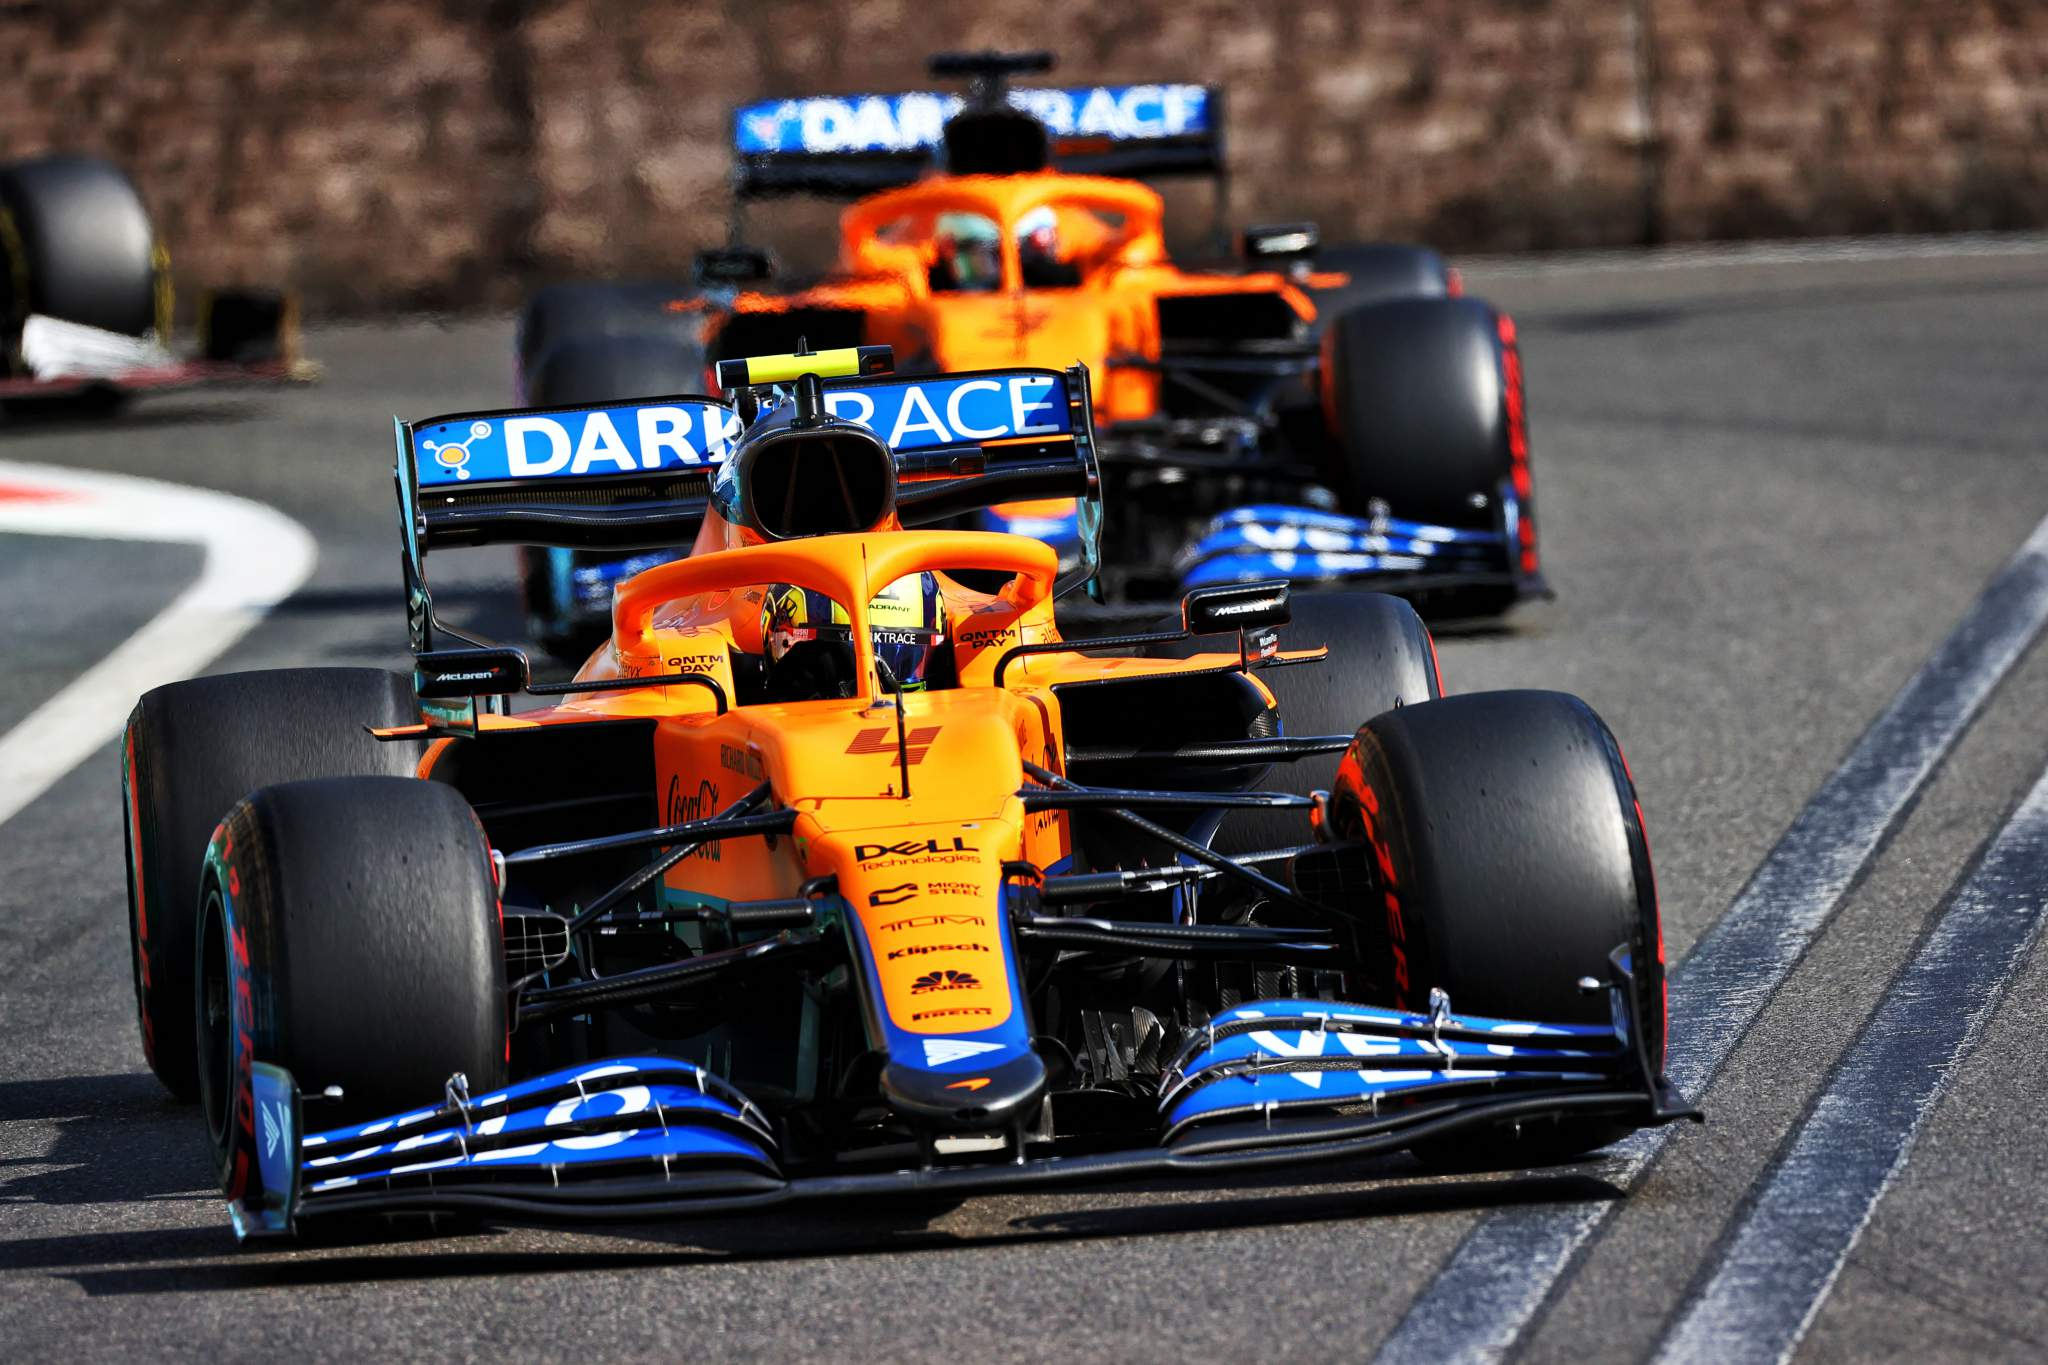 Motor Racing Formula One World Championship Azerbaijan Grand Prix Race Day Baku, Azerbaijan